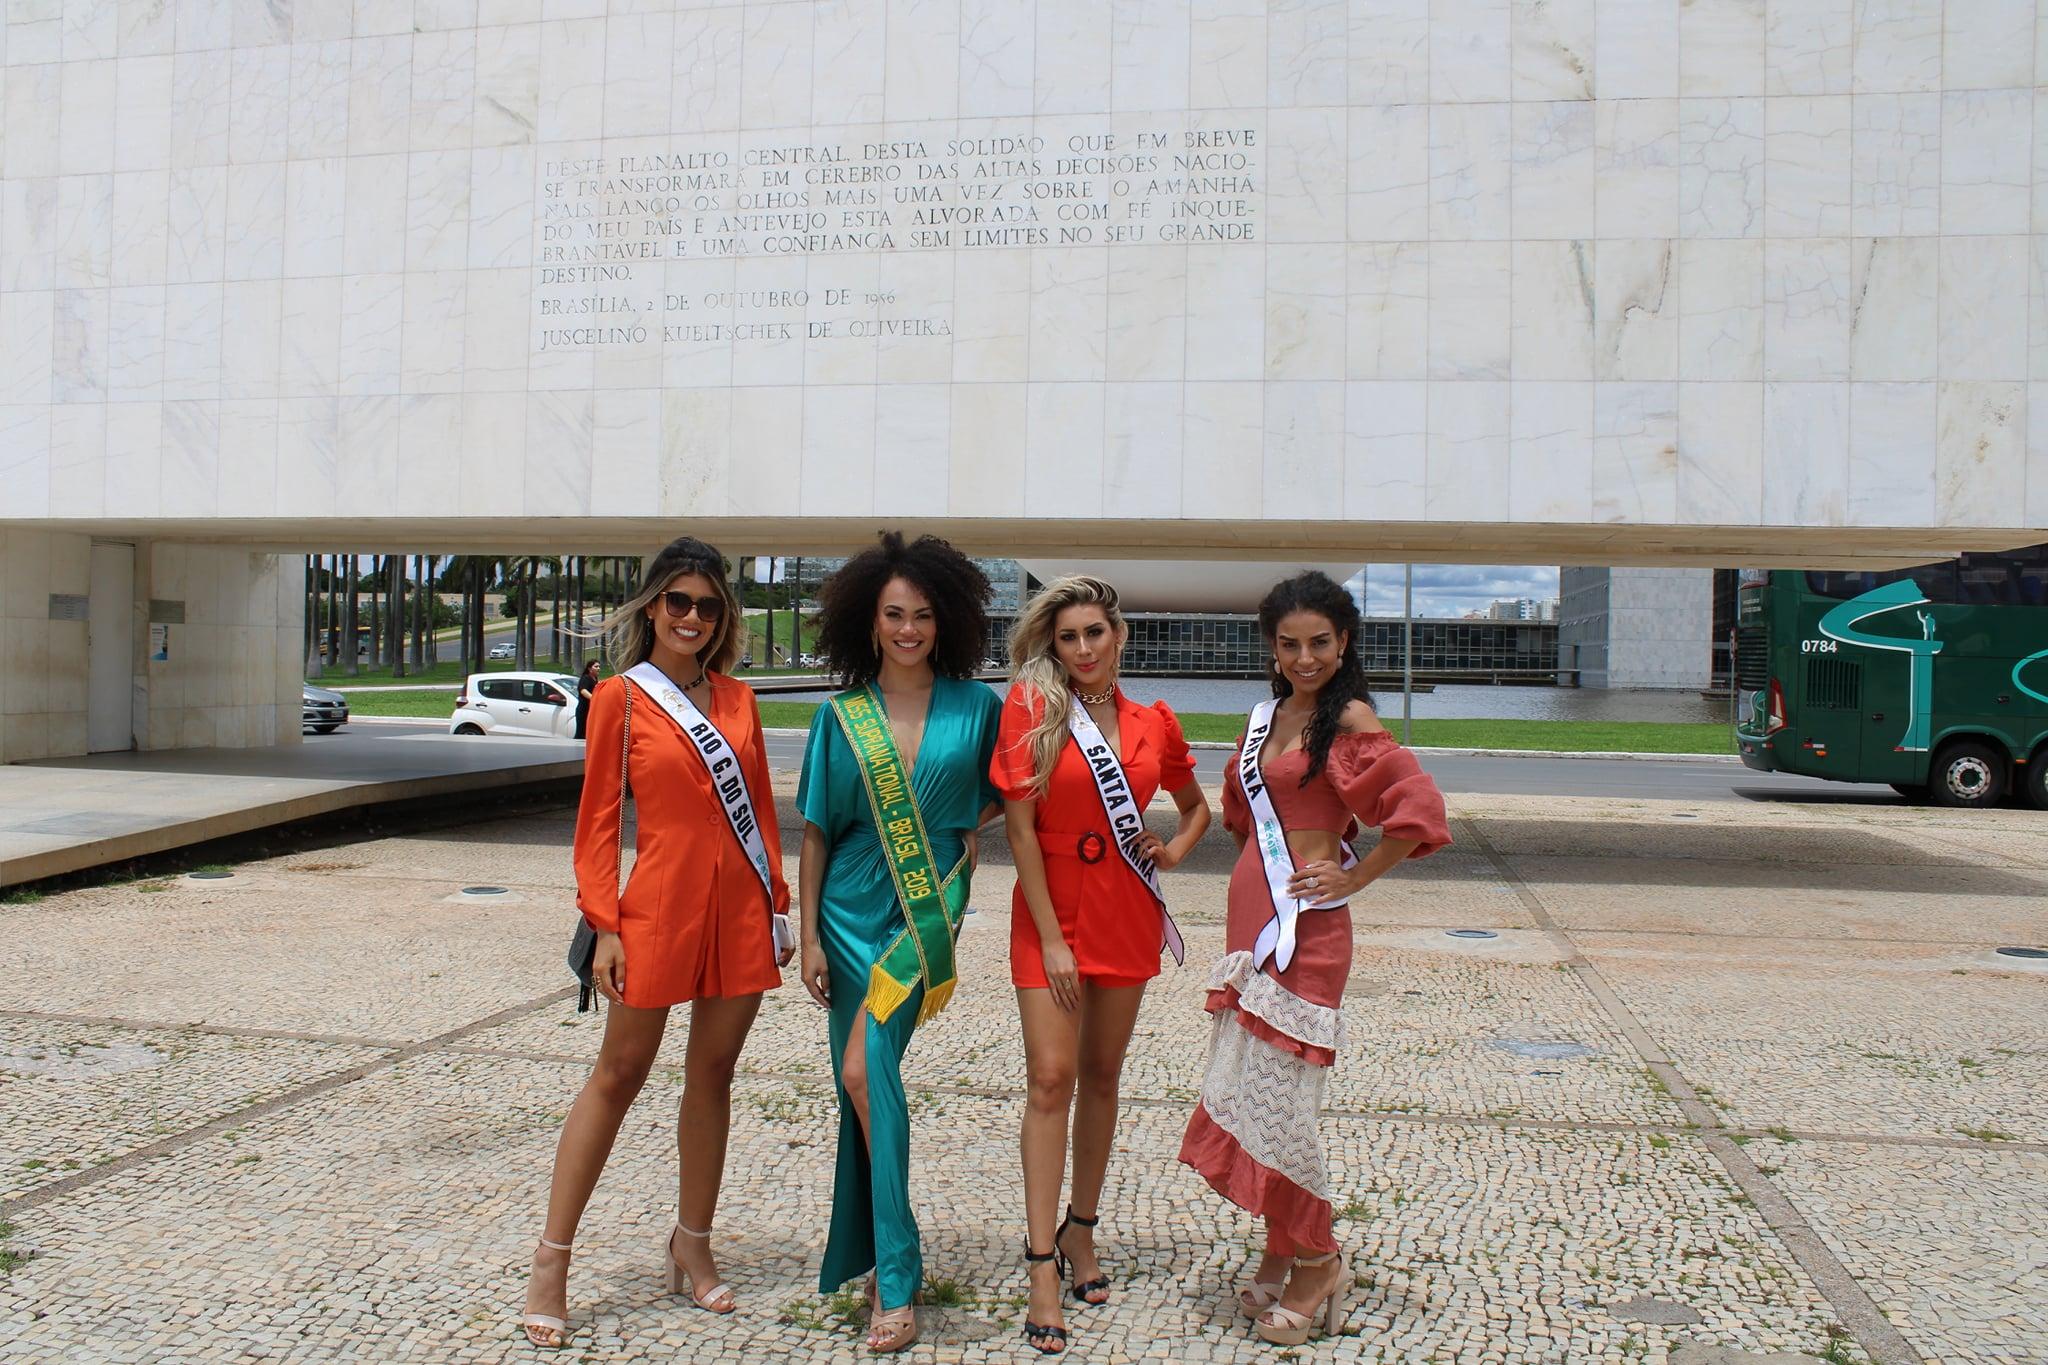 lua paschoalino, miss supranational parana 2020. - Página 5 12791114